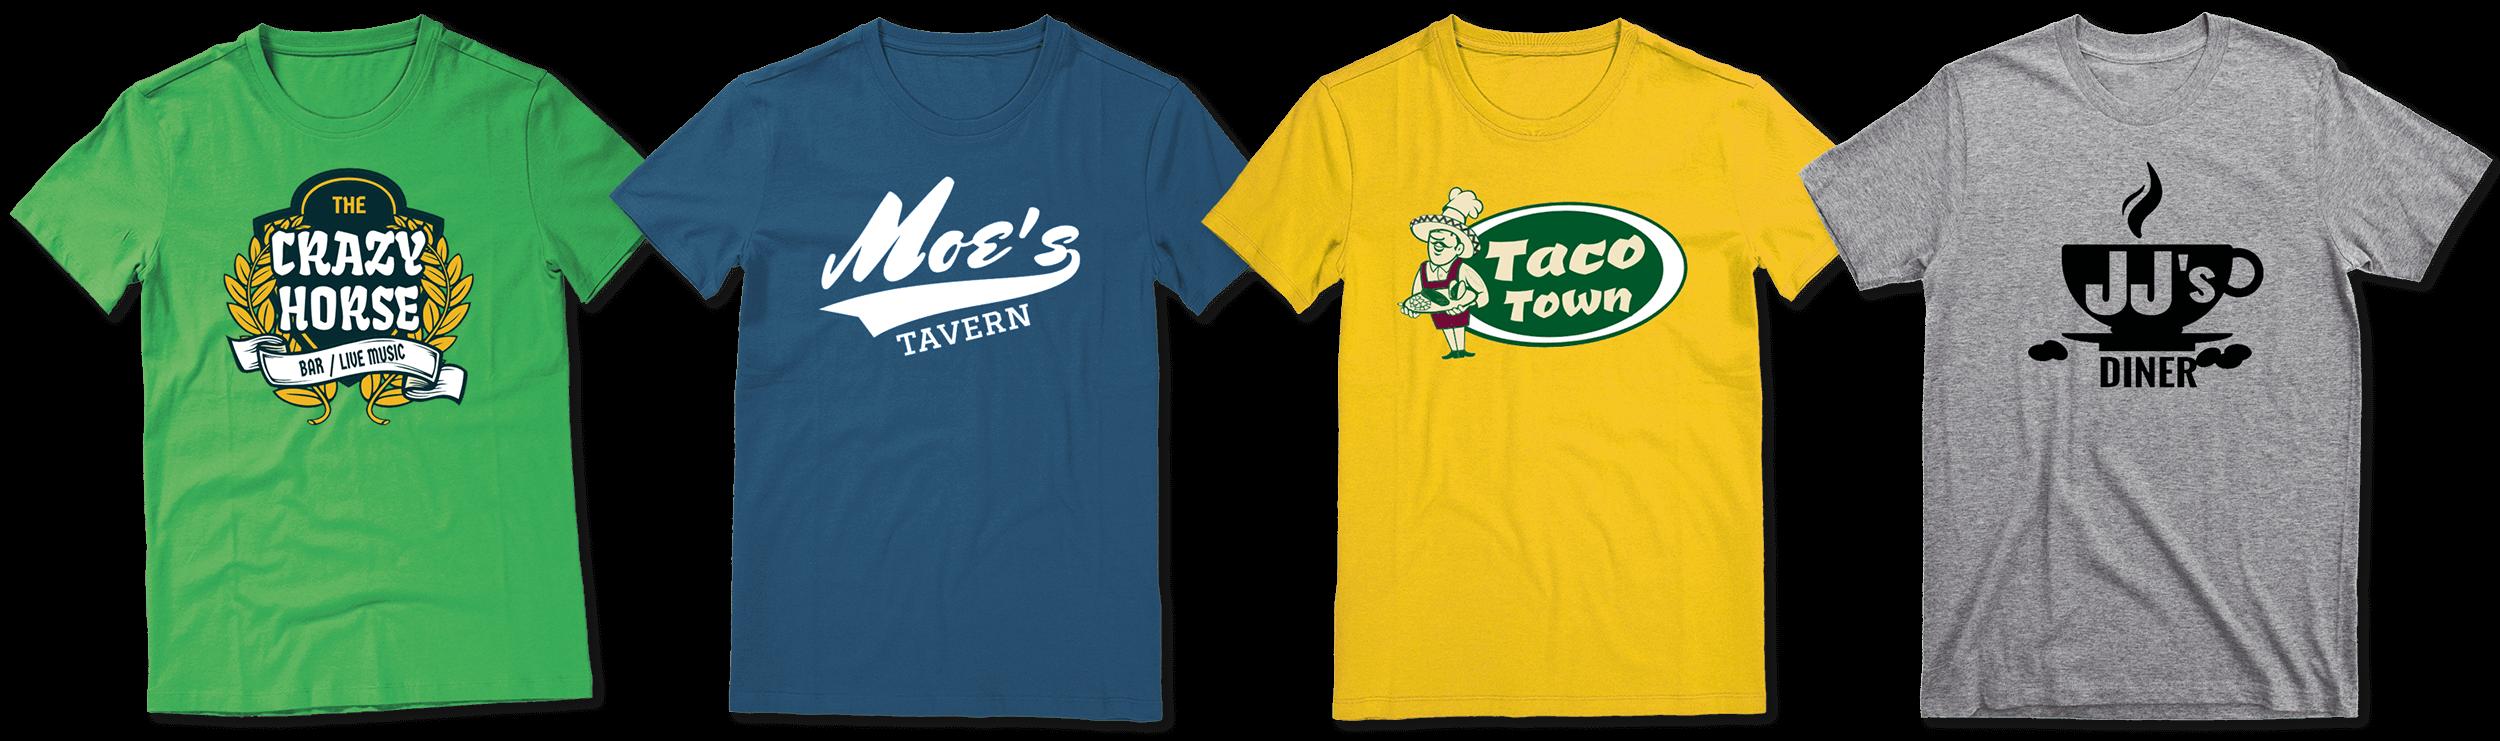 Custom restaurant shirt designs